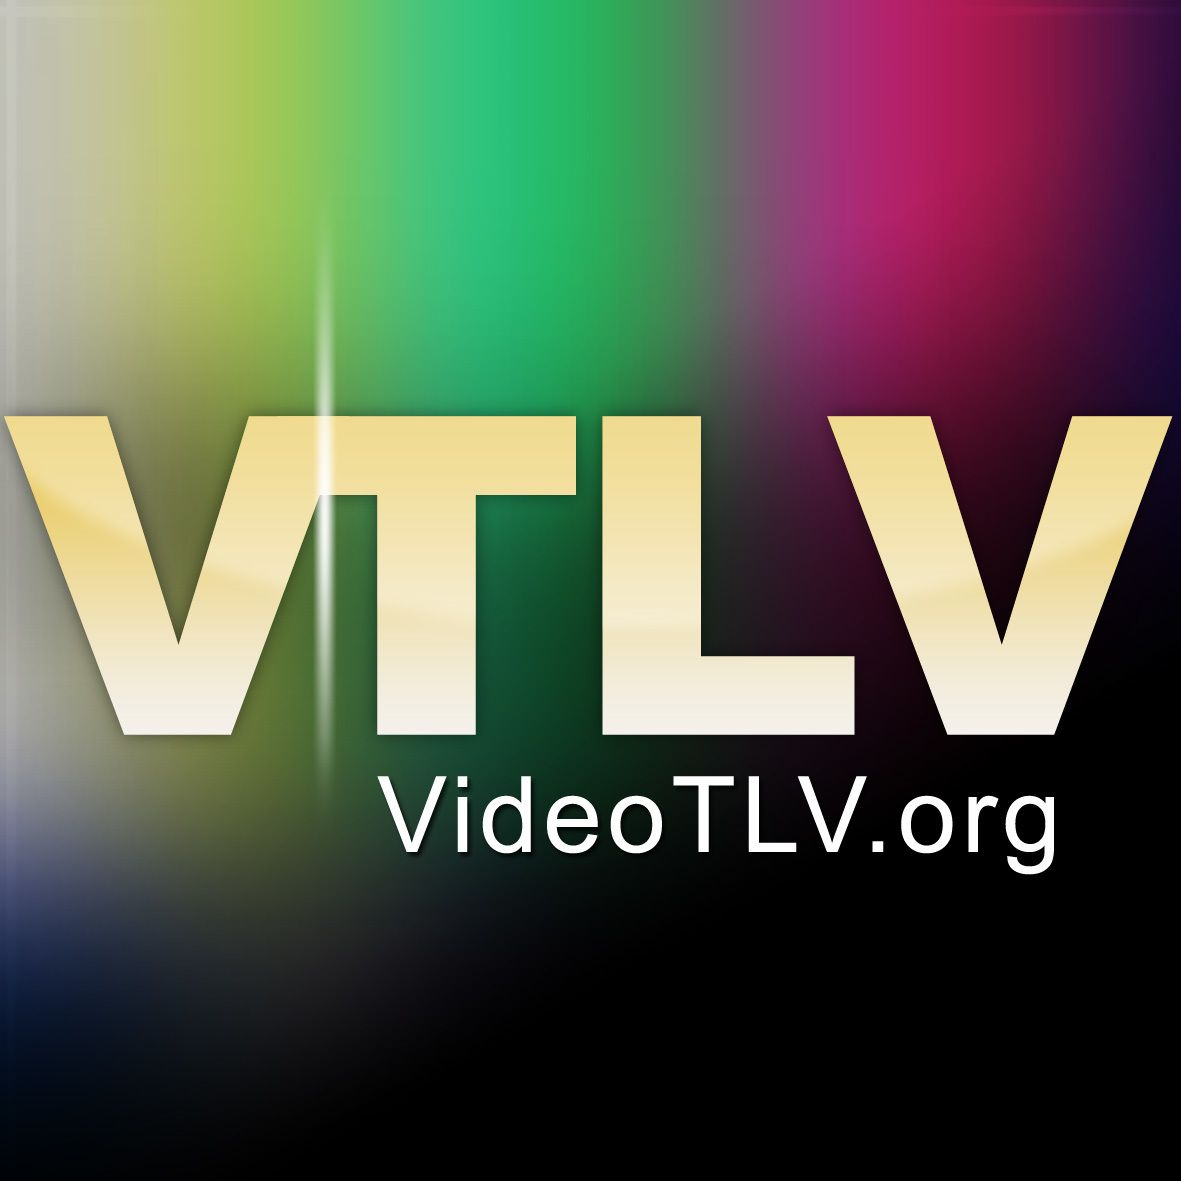 VideoTLV